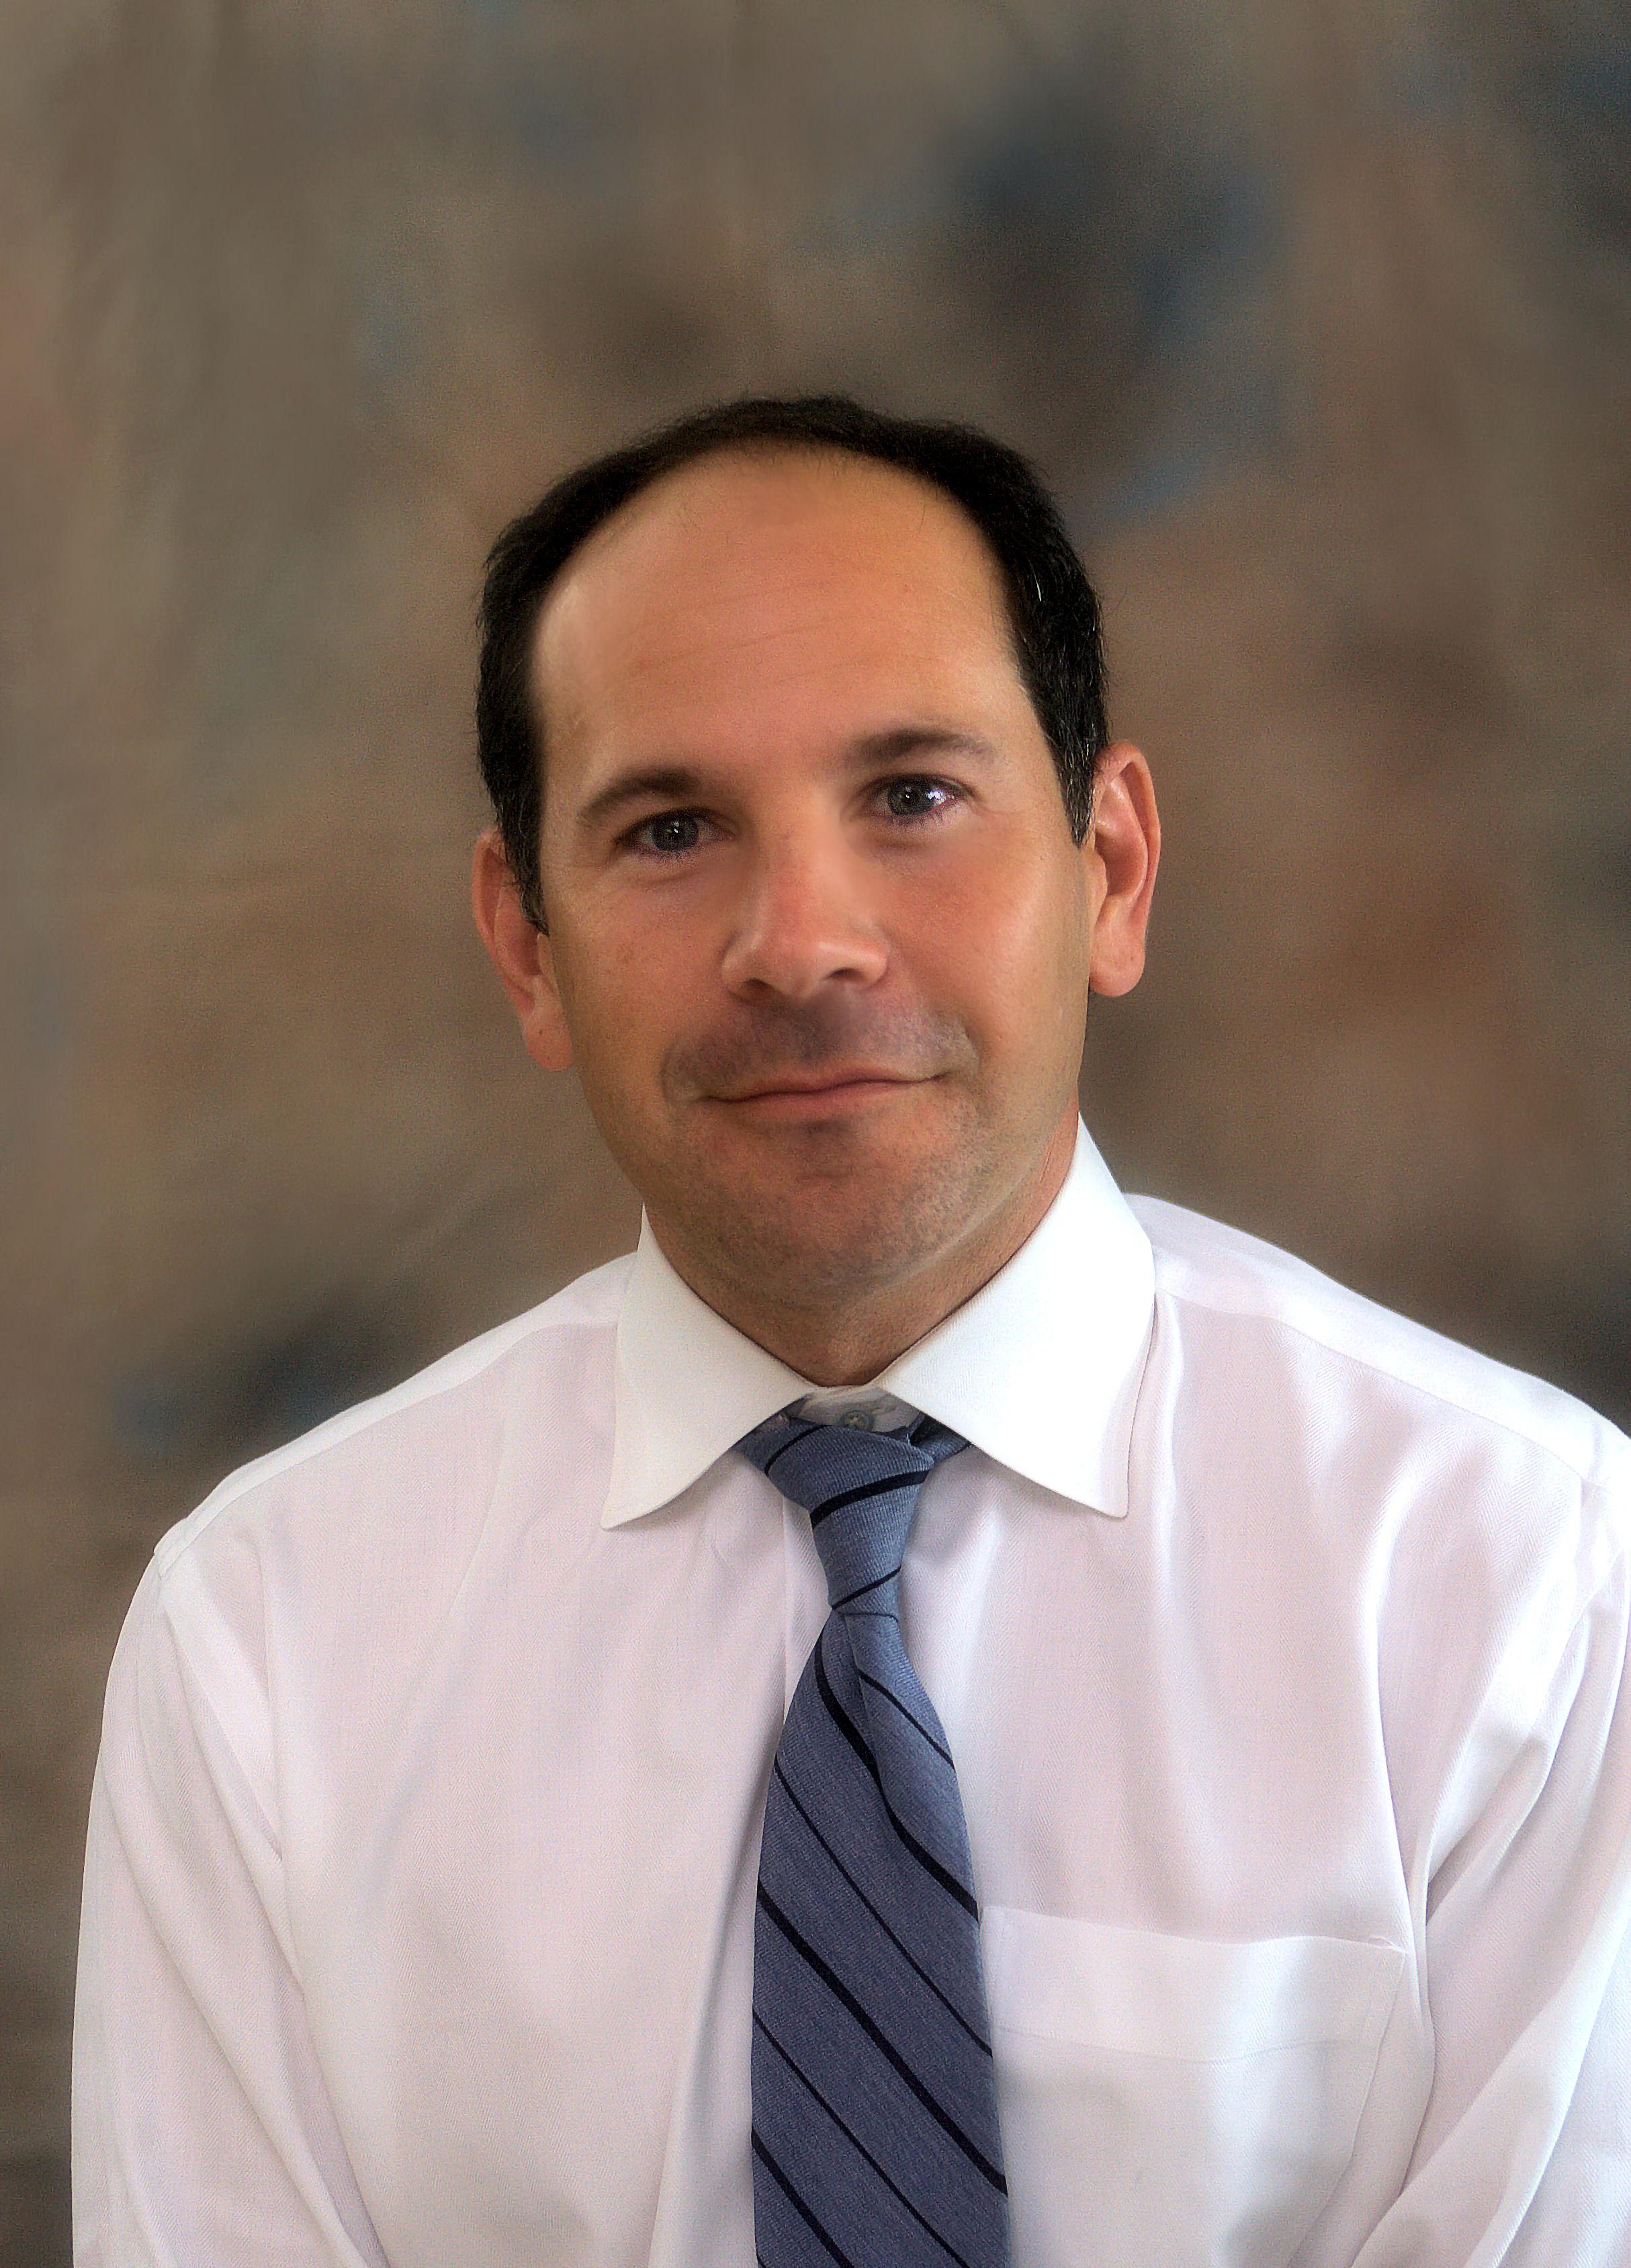 David Socoloff MD